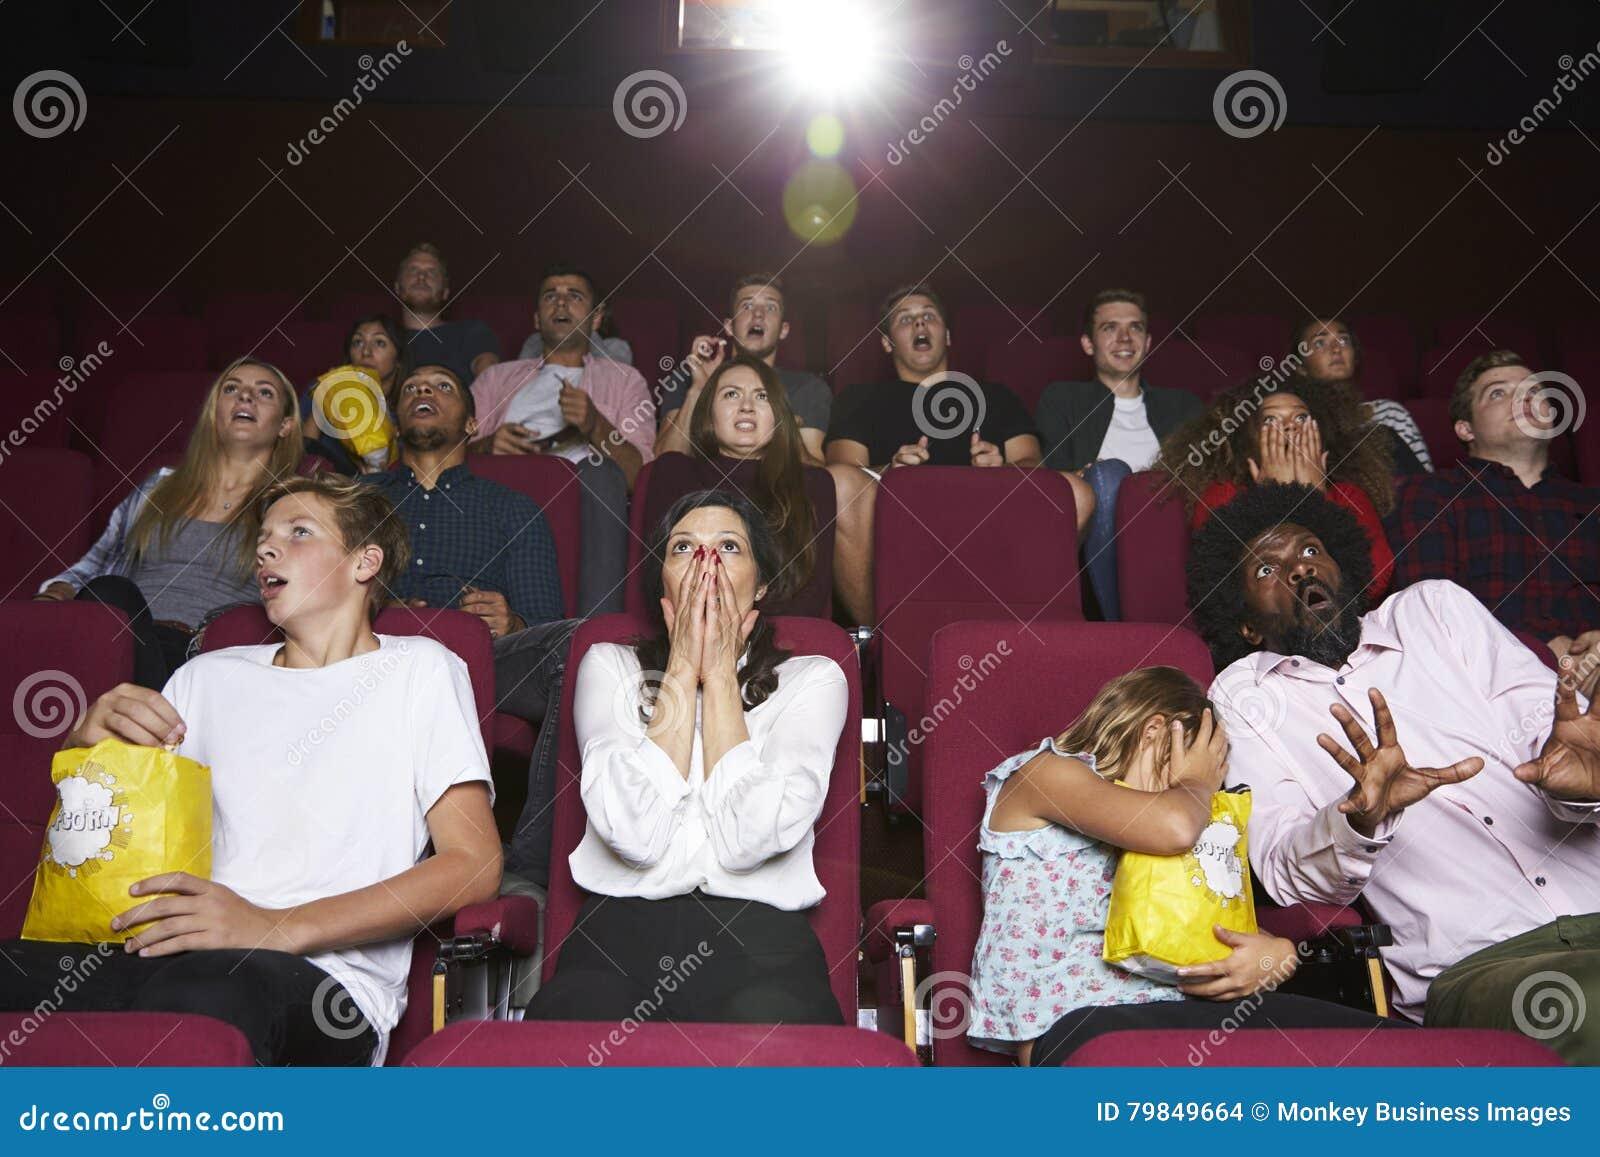 Horrorfilm Kino